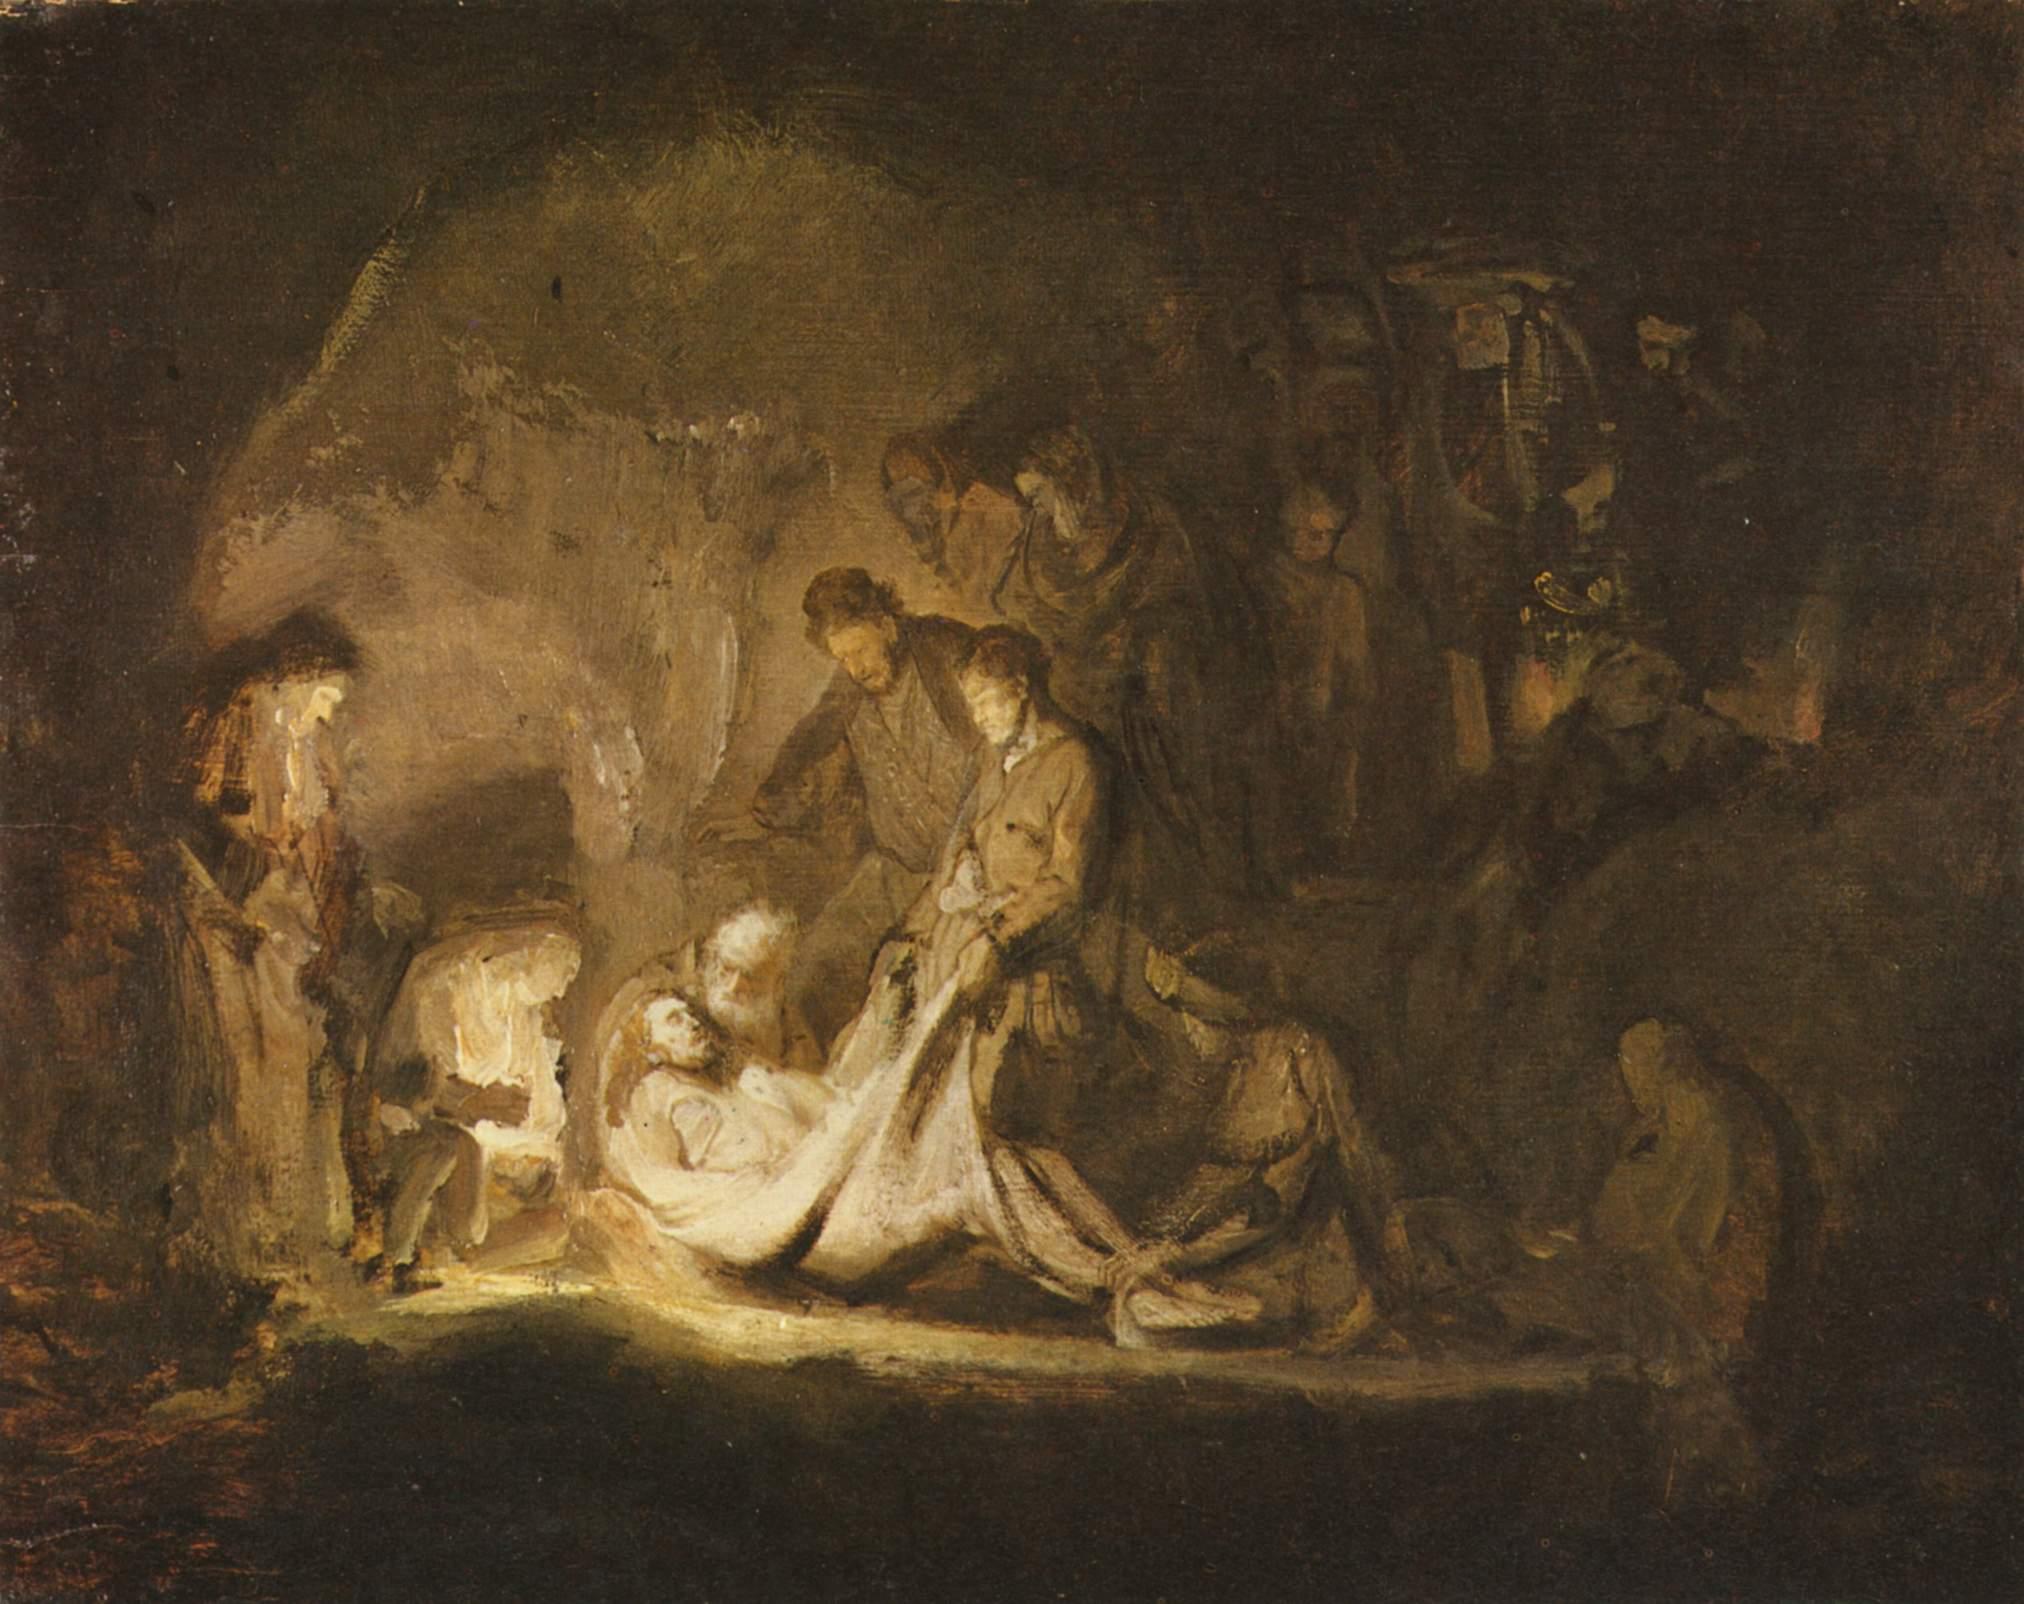 De graflegging van Christus - Wikipedia